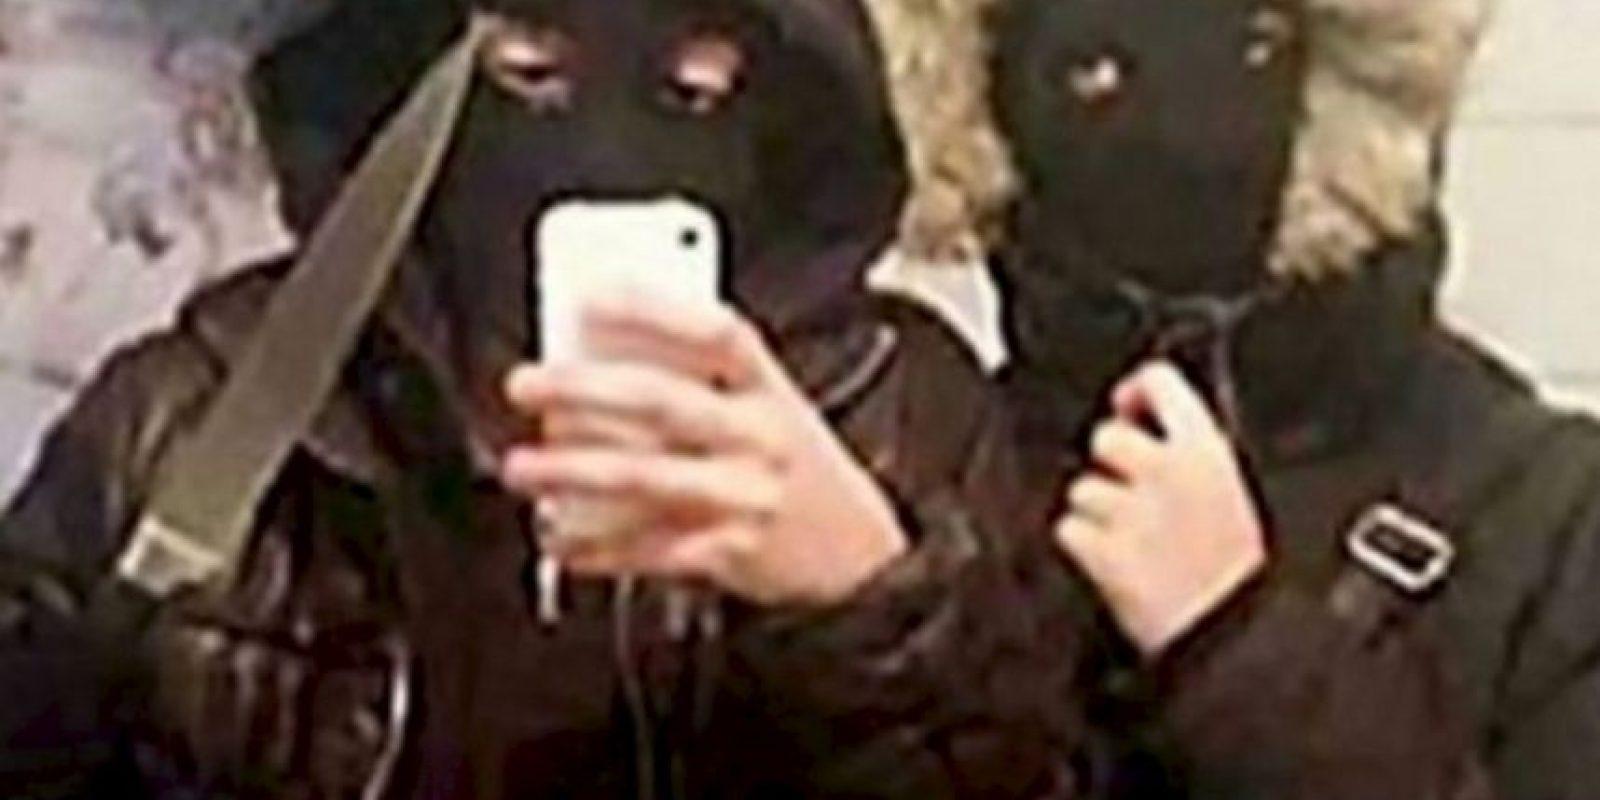 Estos adolescentes se retrataron momentos antes de robar 400 dólares. Foto:Twitter